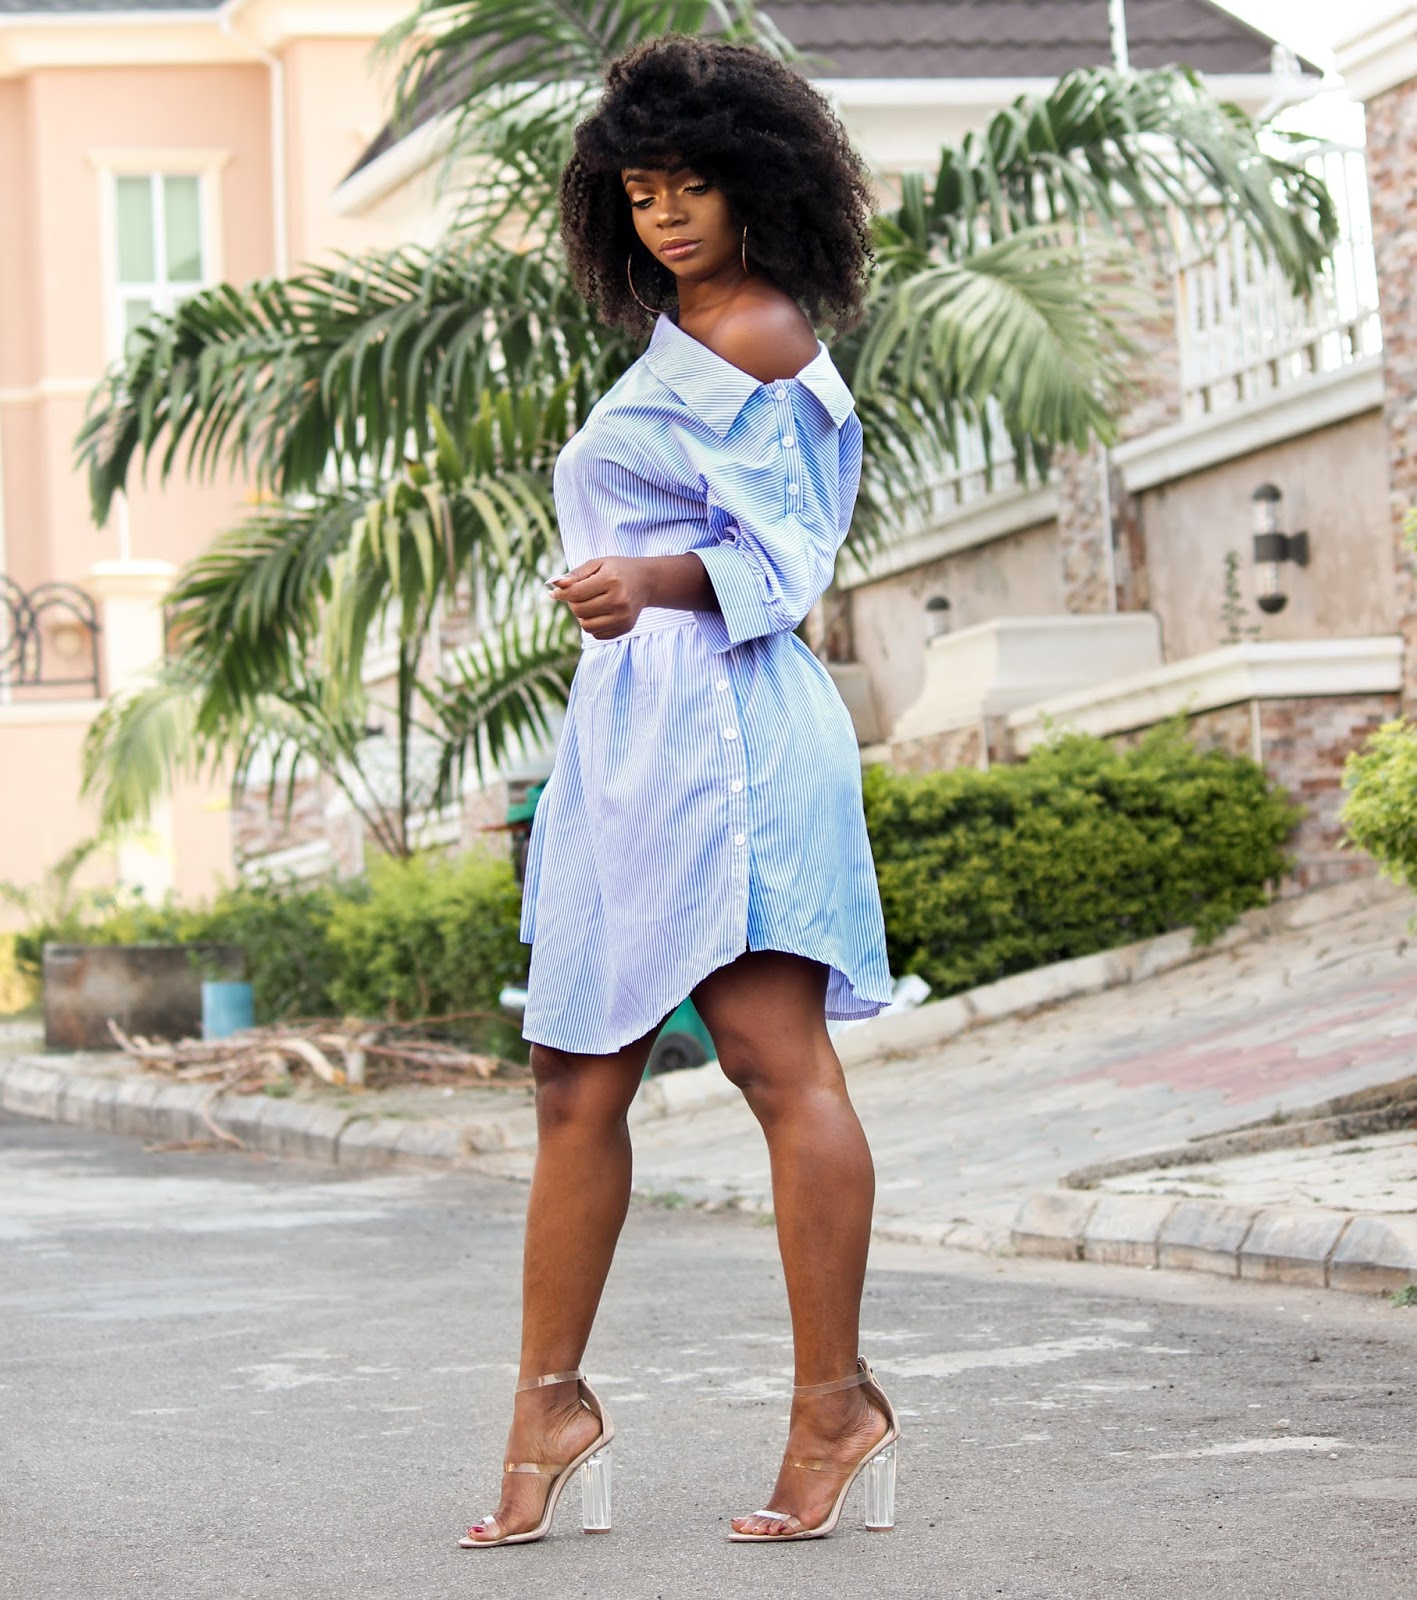 OFF SHOULDER STRIPED DRESS - Blue Off Shoulder Striped Dress from Jumia